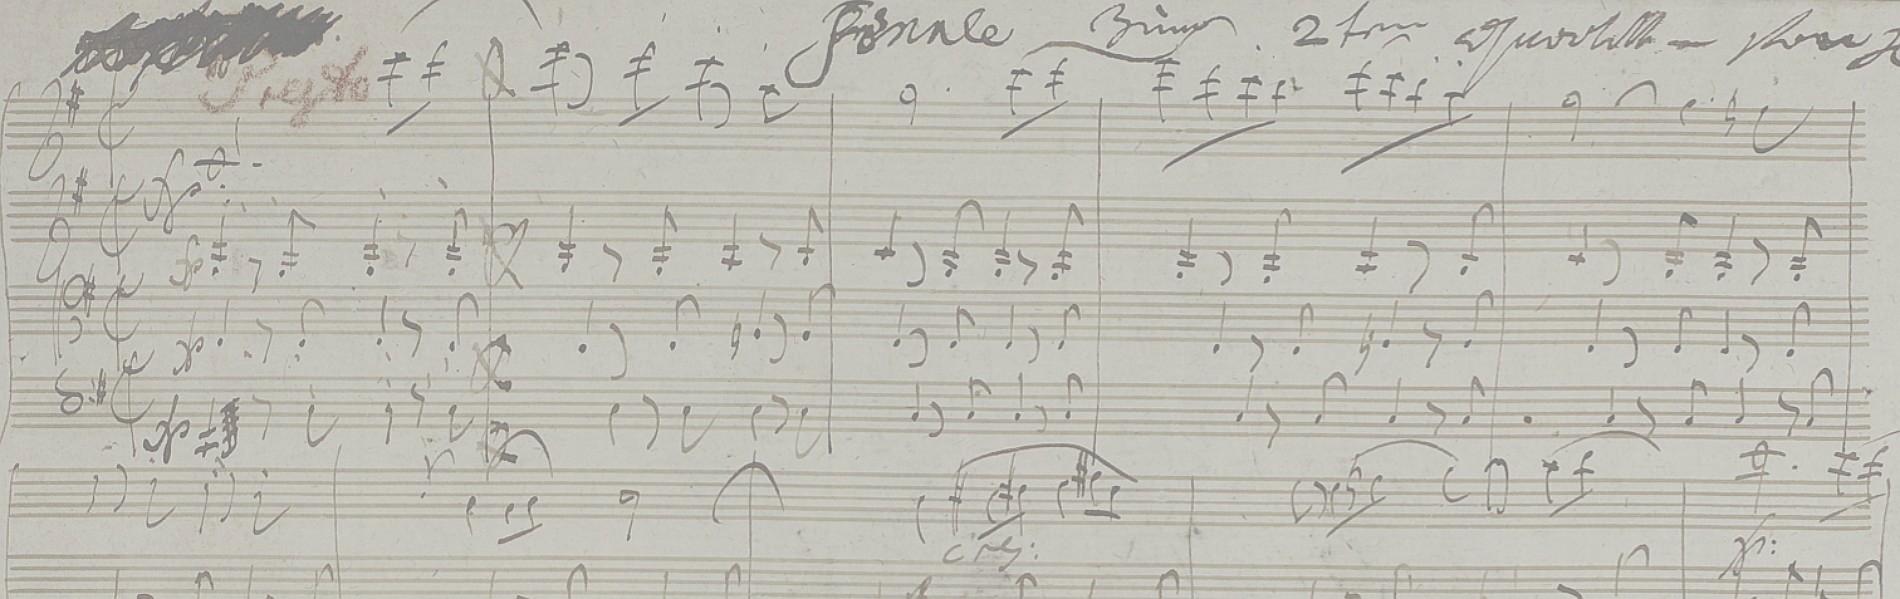 Beethoven's Imagination